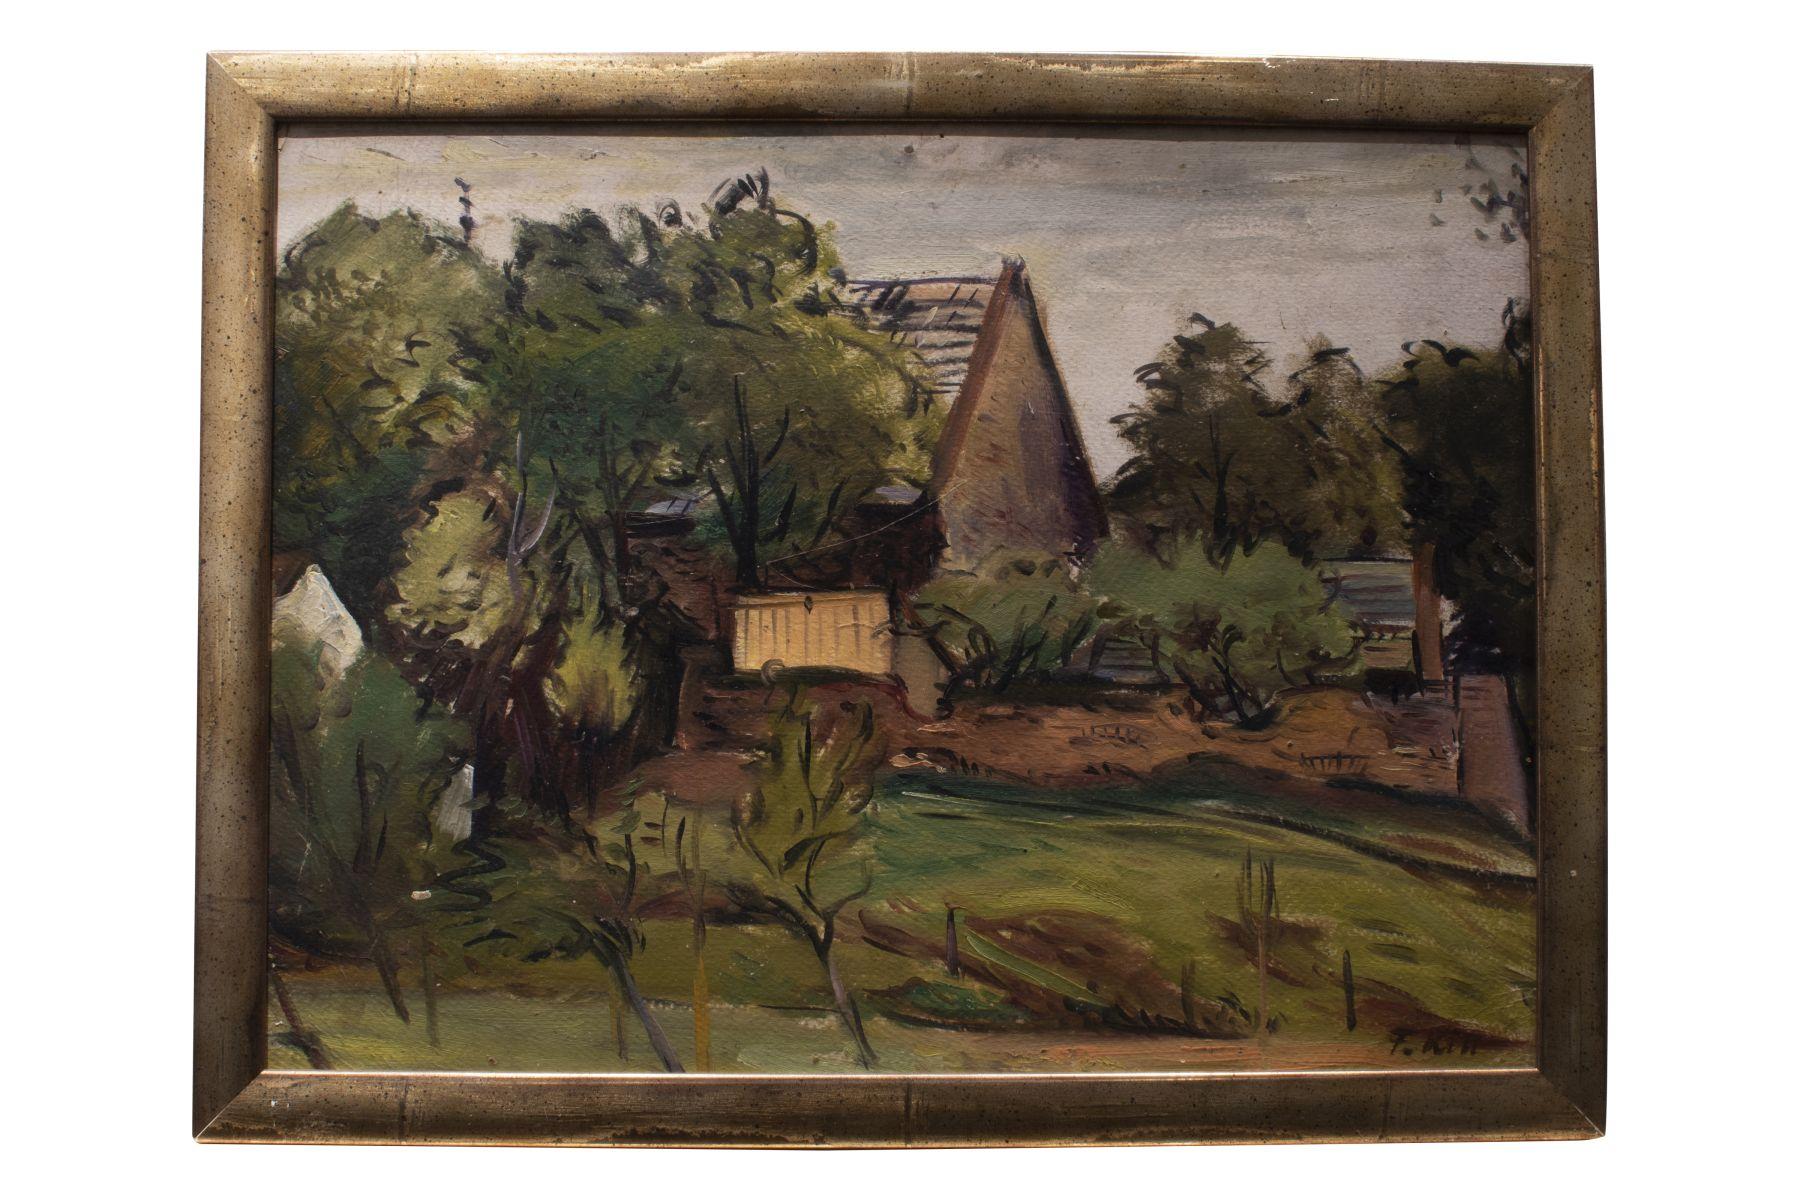 "#152 Ferdinand Kitt (1887-1961)"" Garden landscape with house"" | Ferdinand Kitt (1887-1961) ""Gartenlandschaft mit Haus"" Image"